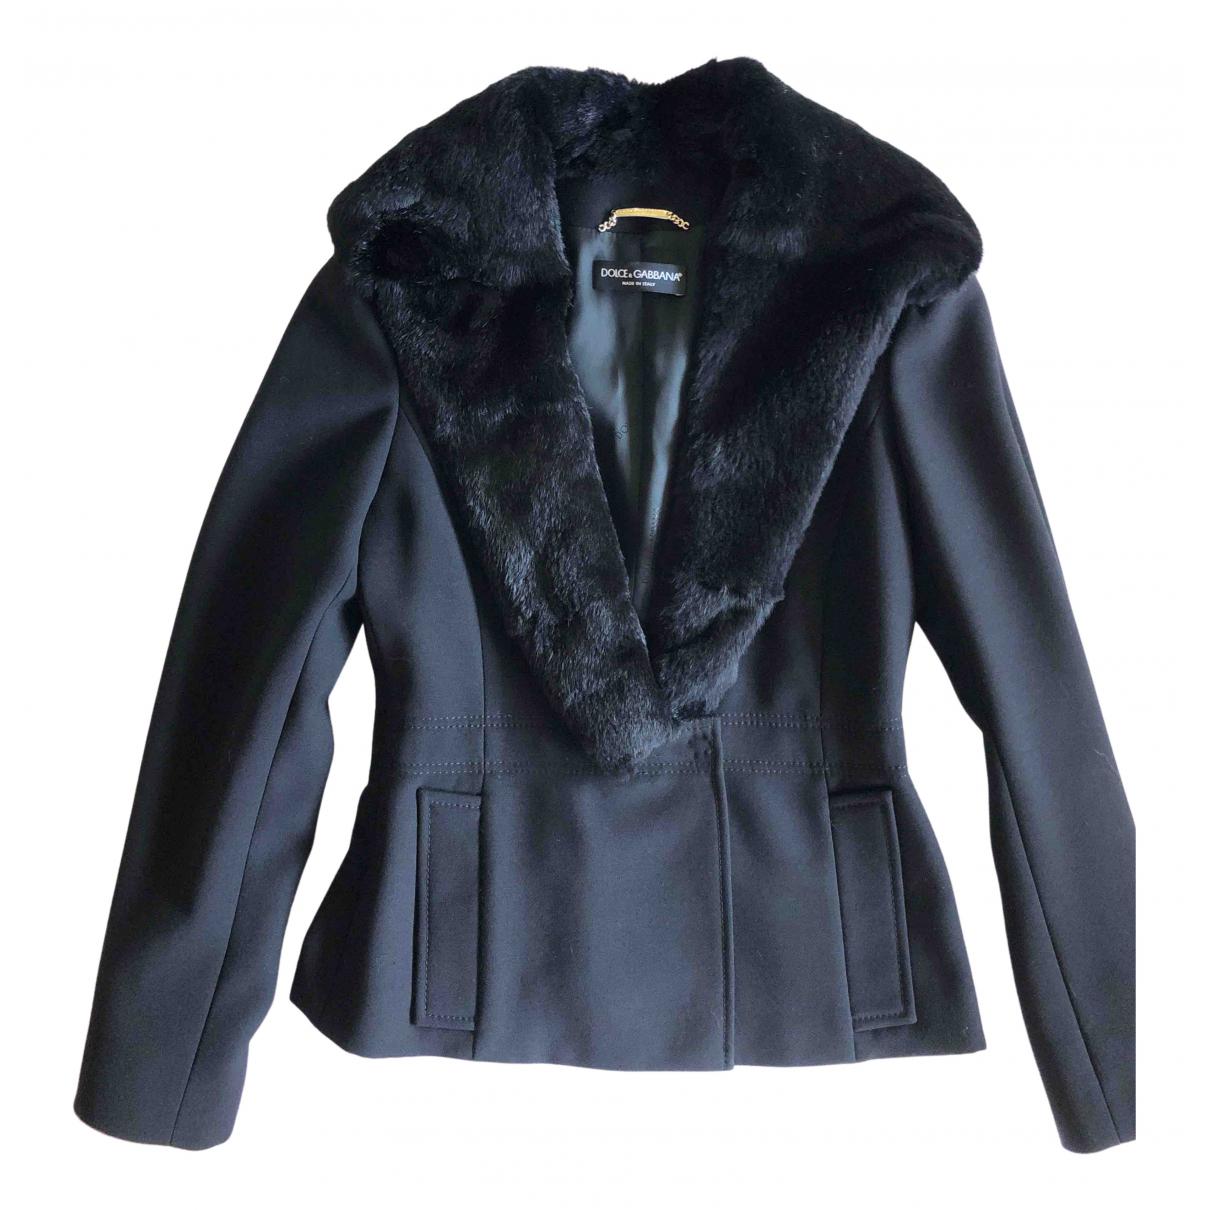 Blazer de Lana Dolce & Gabbana